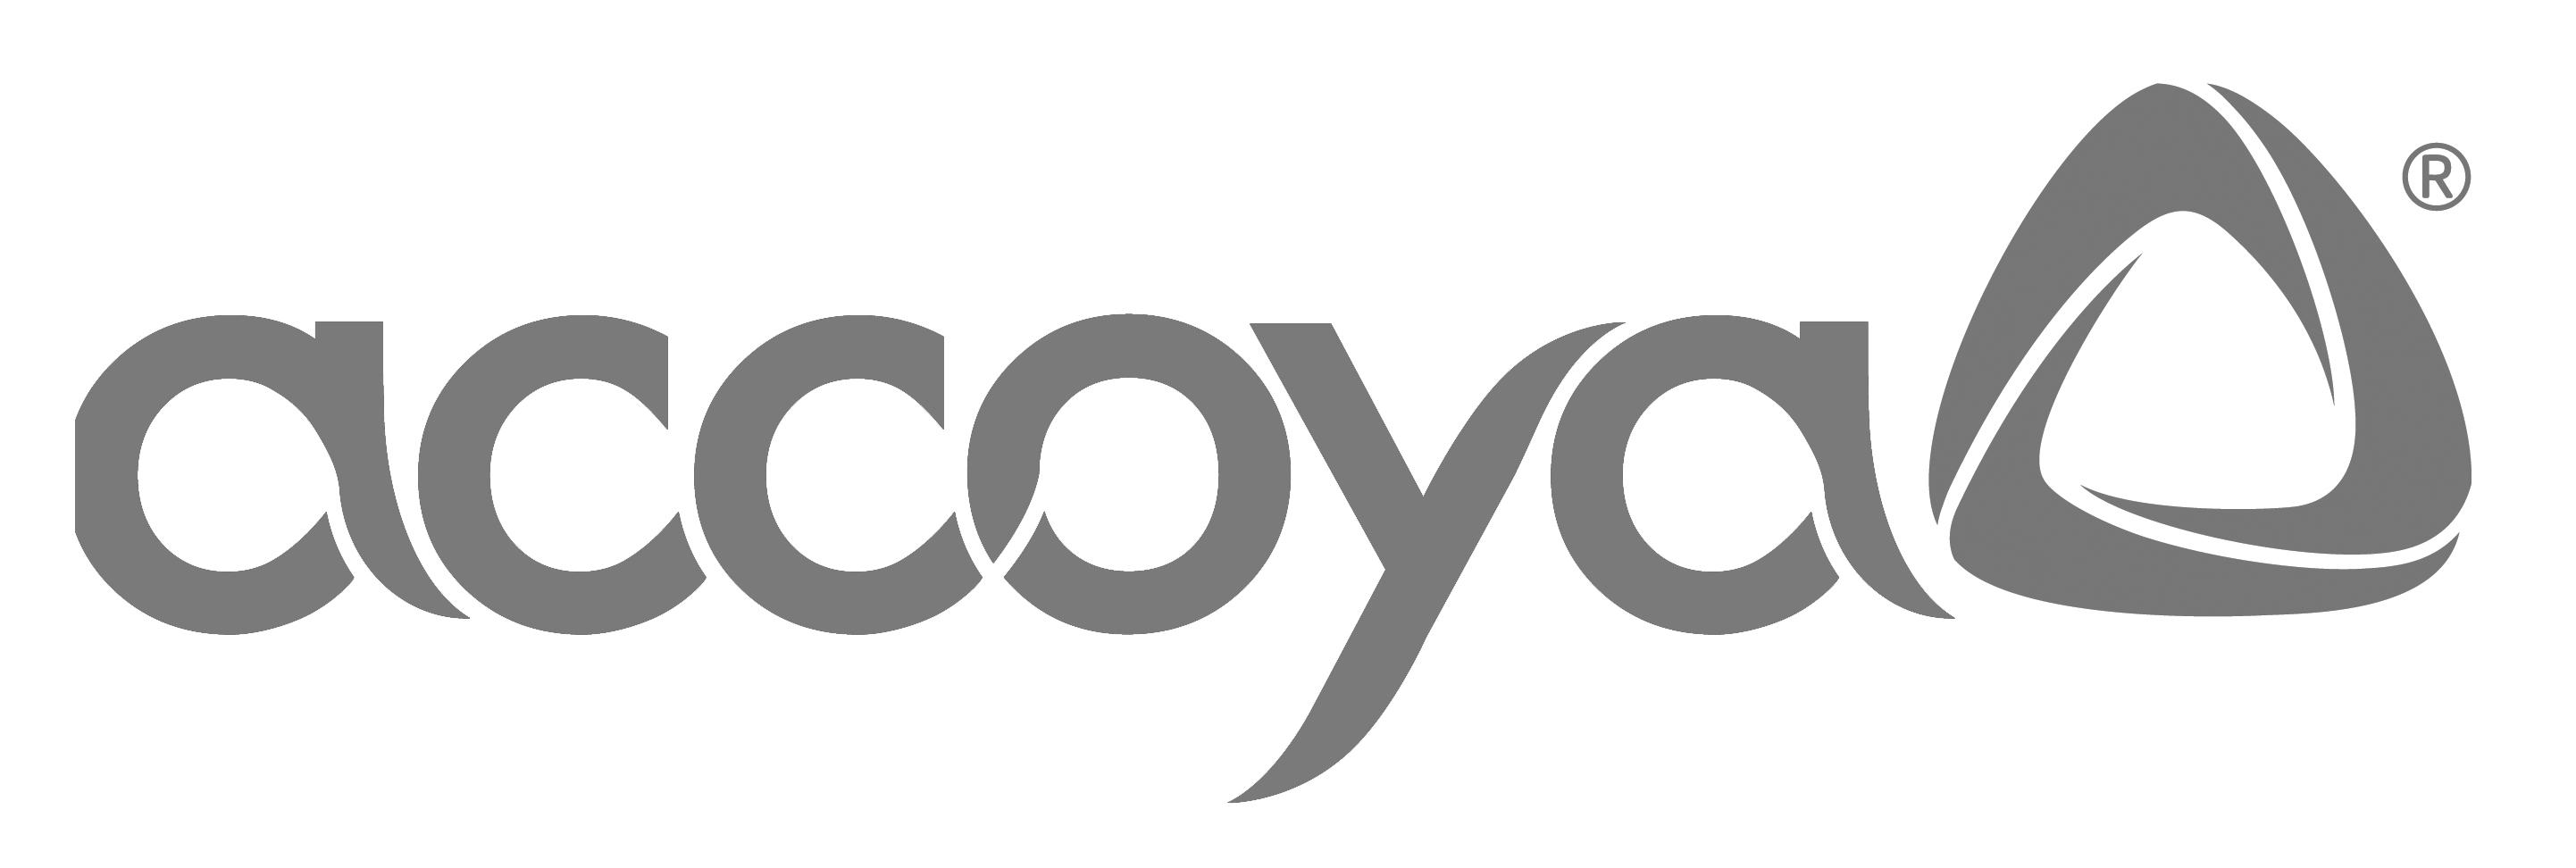 Accoya Products